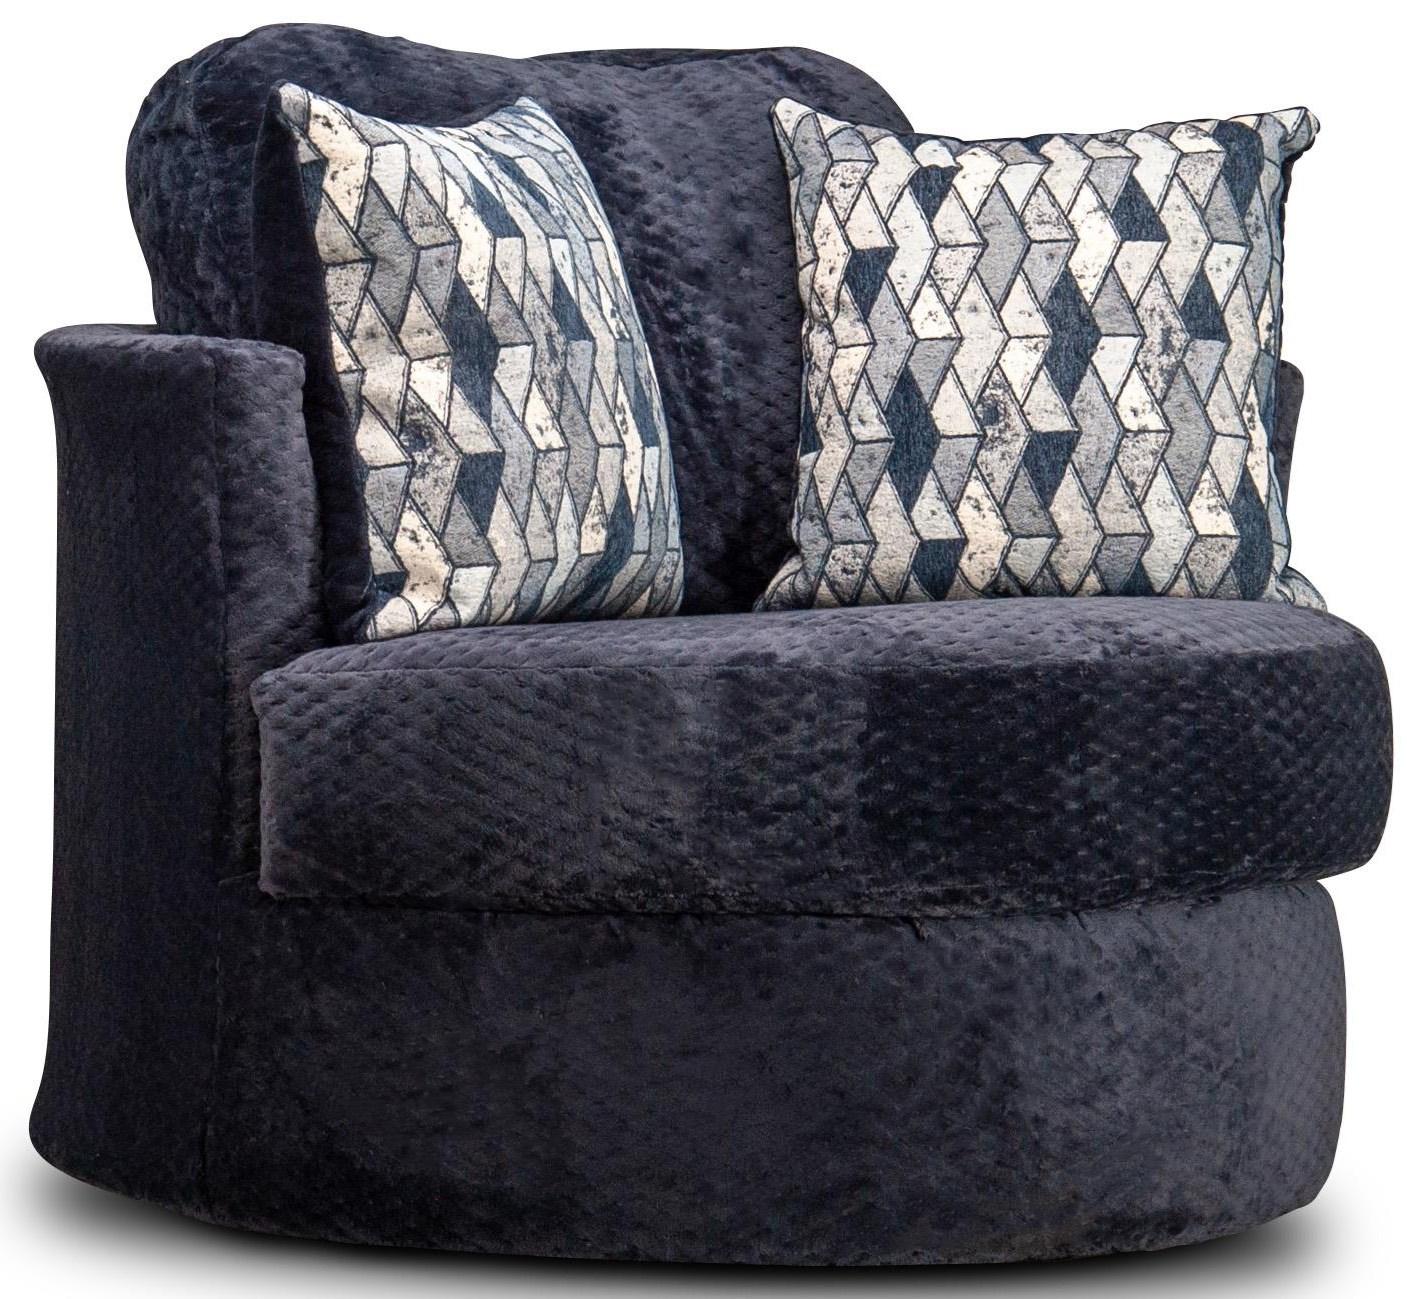 Leora Leora Barrel Chair by Peak Living at Morris Home